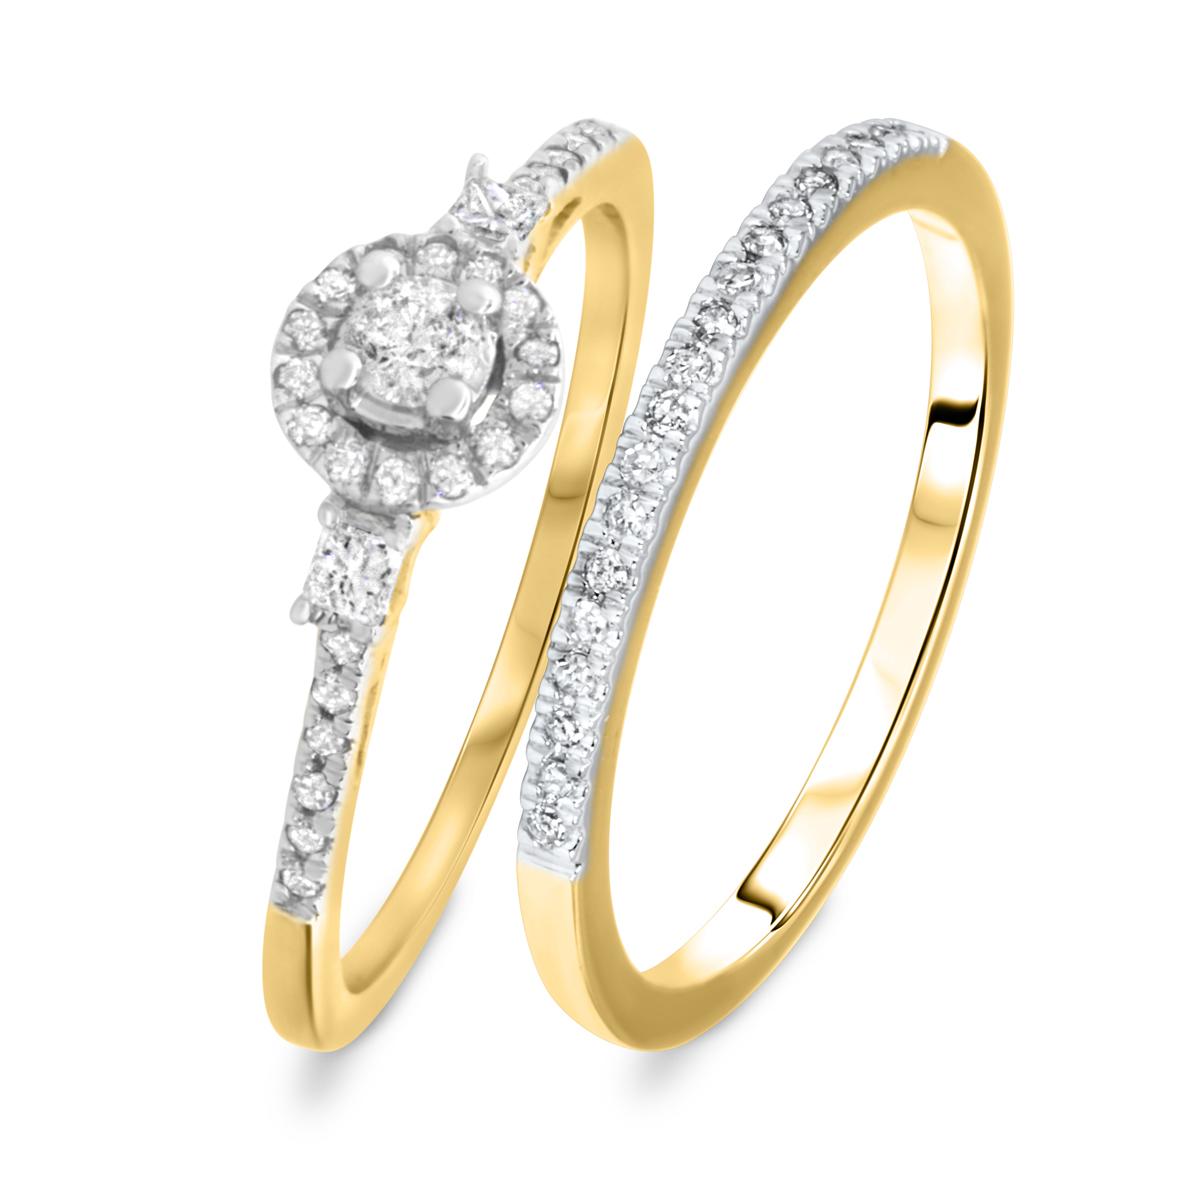 1/3 CT. T.W. Round Cut Diamond Ladies Bridal Wedding Ring Set 10K Yellow Gold